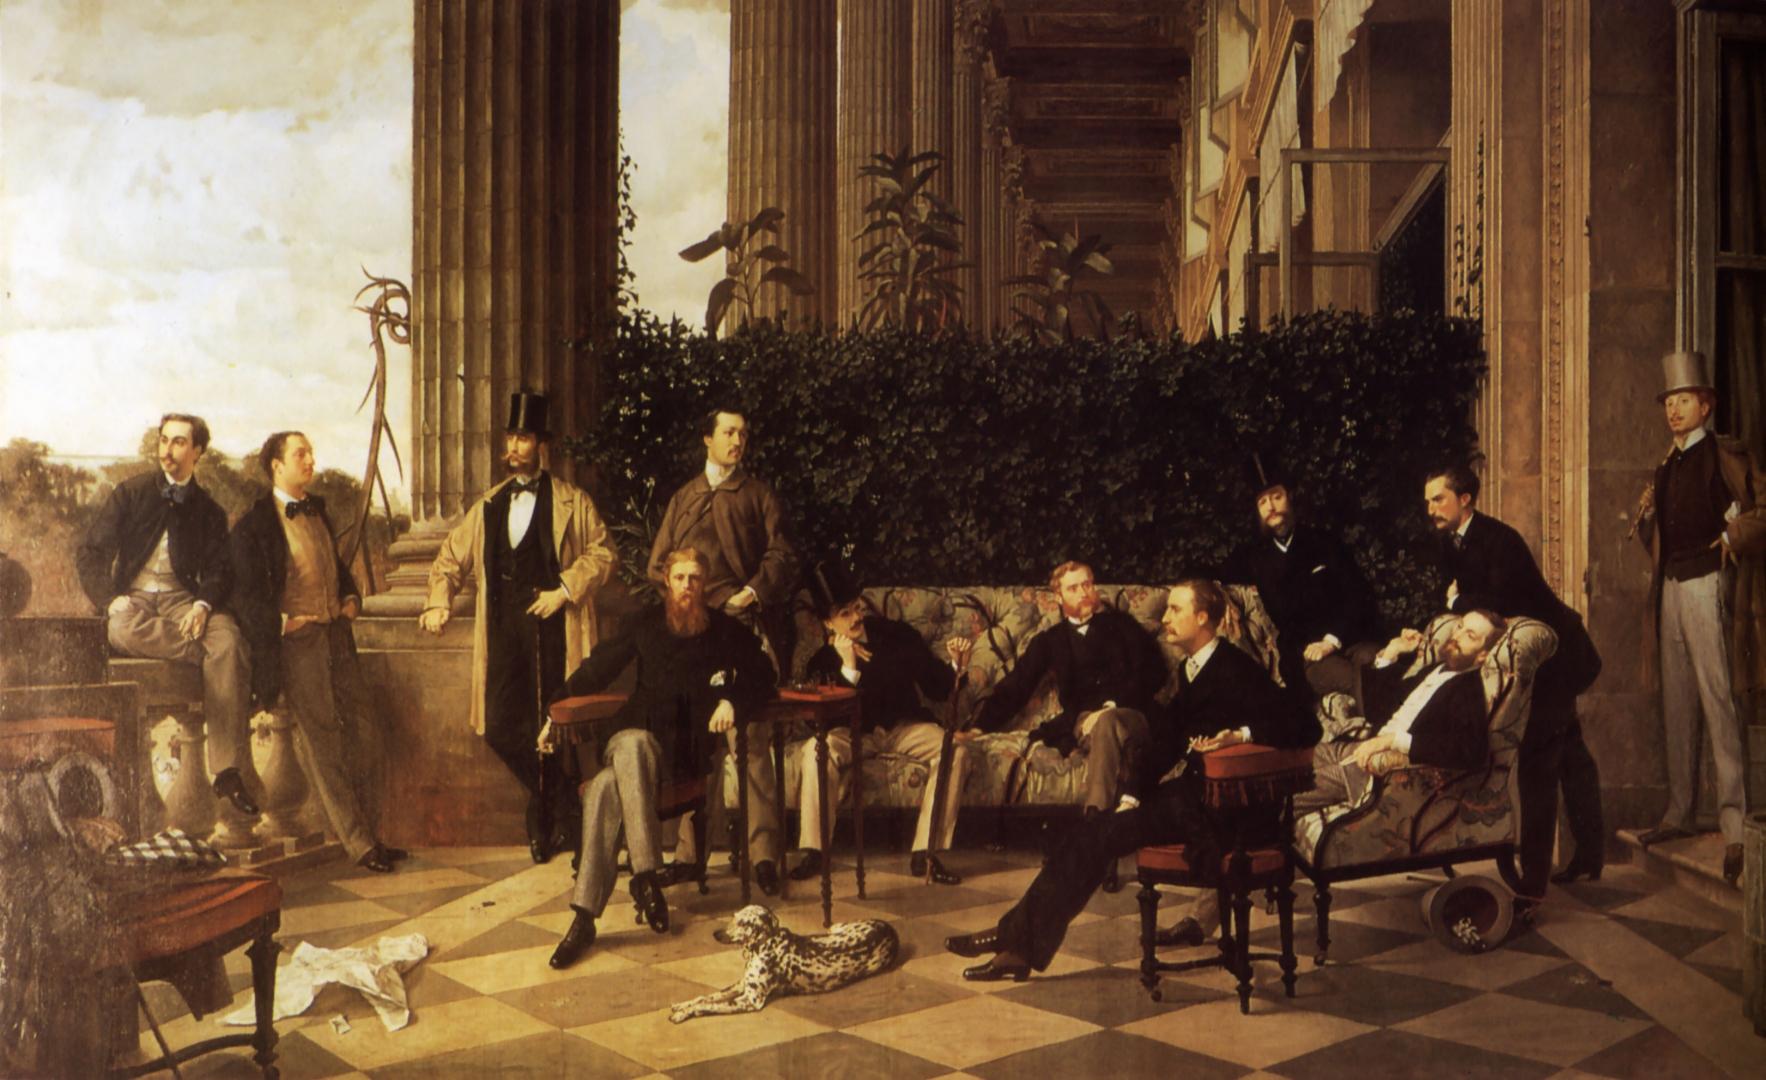 Джеймс Тиссо. Круг общения. 1868